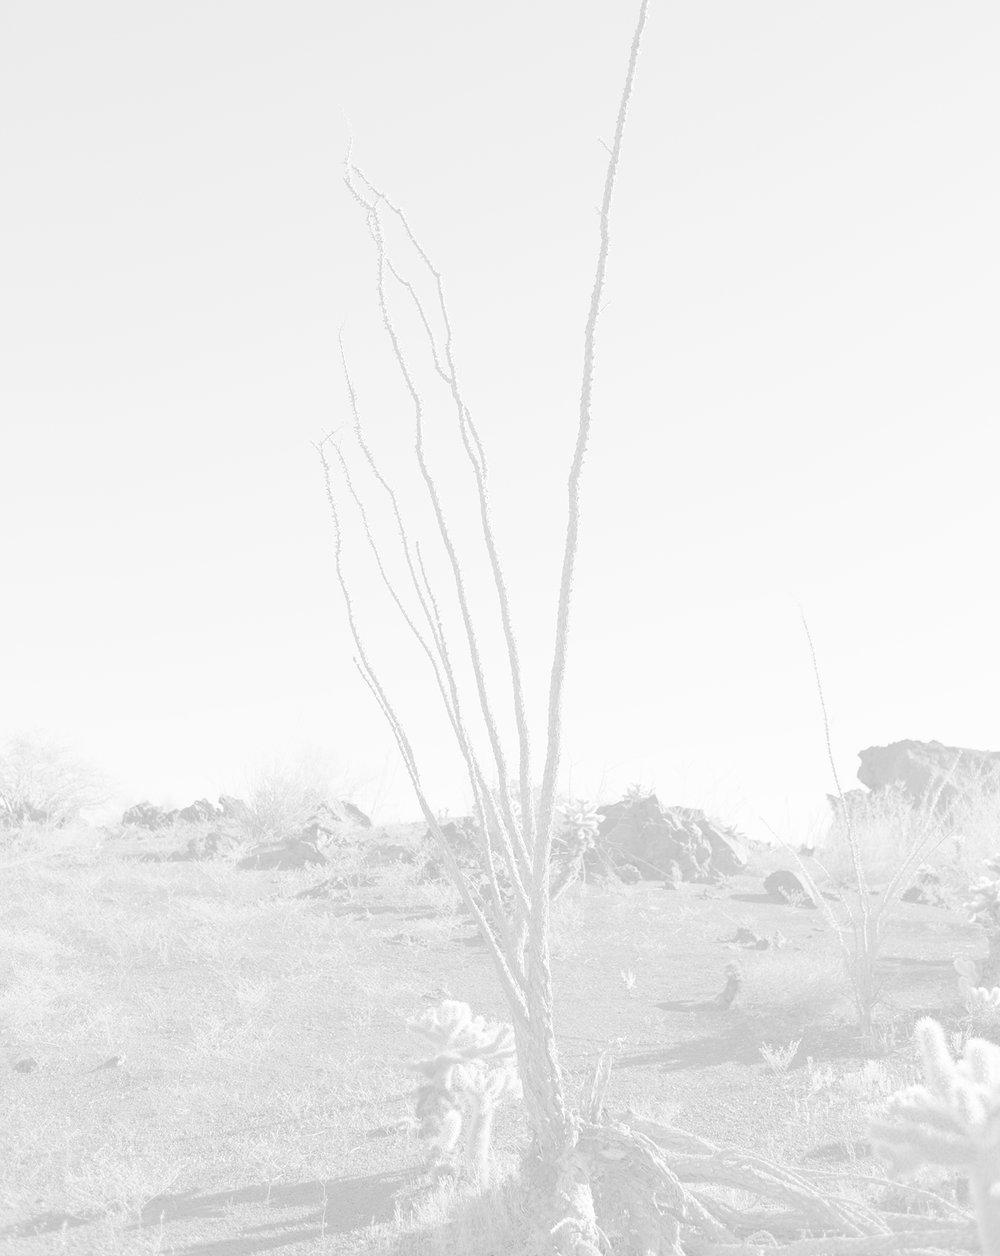 scott b. davis  ocotillo, ocotillo (no. 9), 2015/2016 palladium print 20 x 16 inches edition of 5